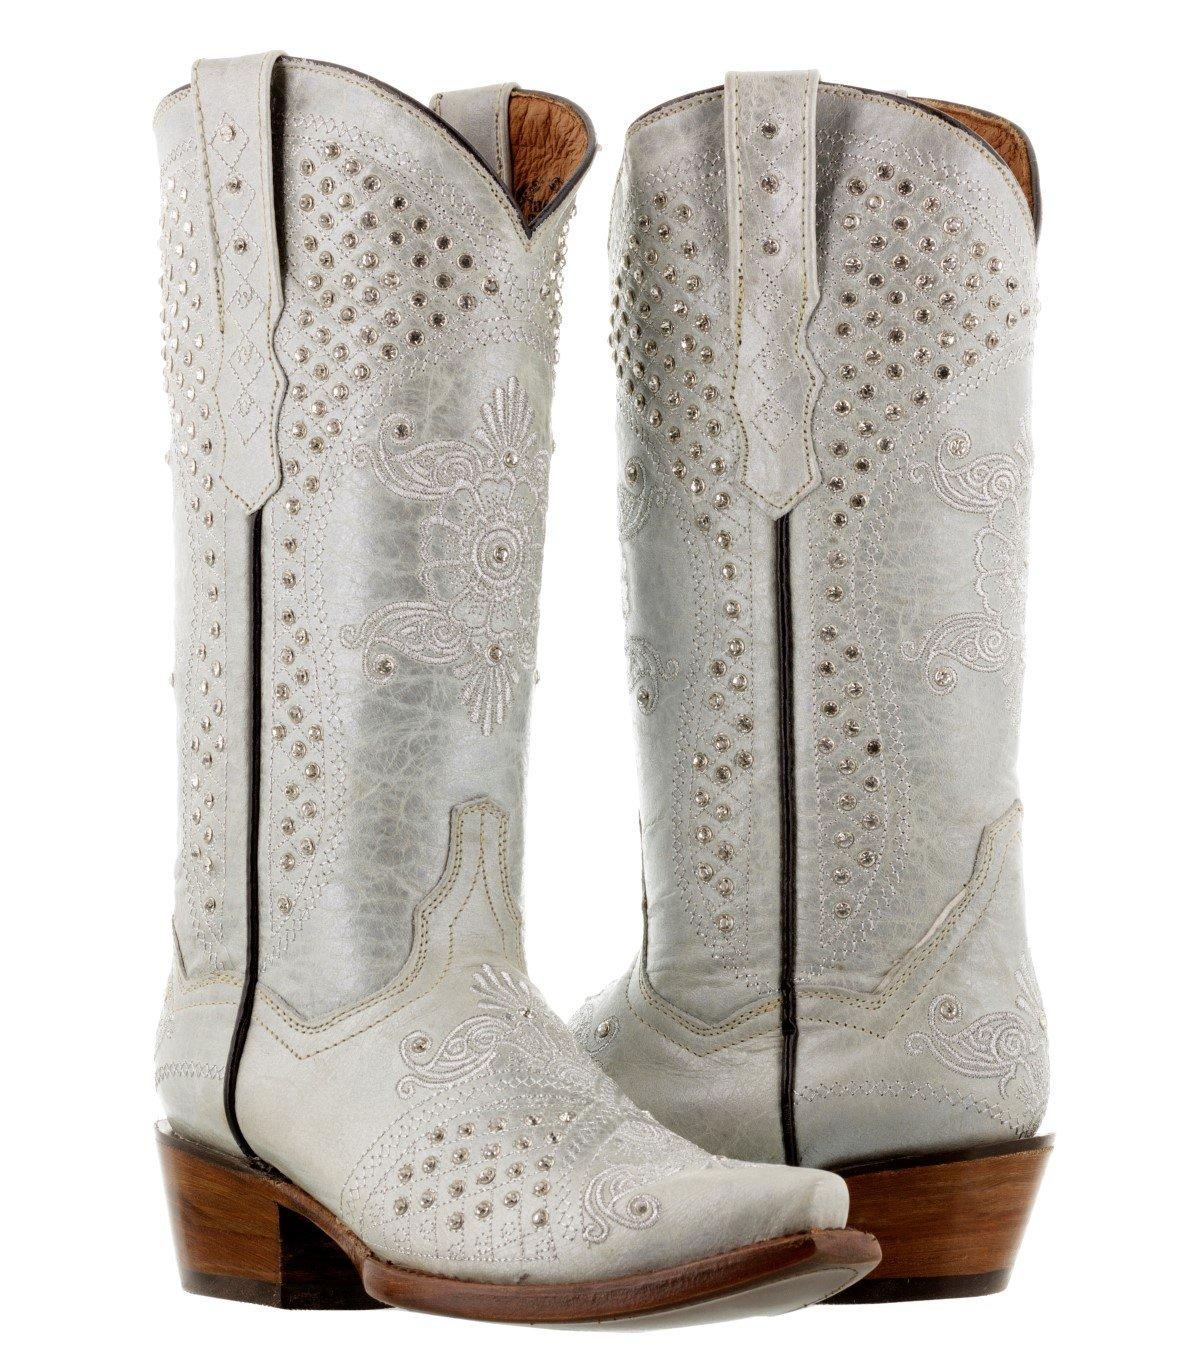 Cowboy Professional Women's Pearl White Marfil Rhinestones Wedding Cowboy Boots Snip 11 BM